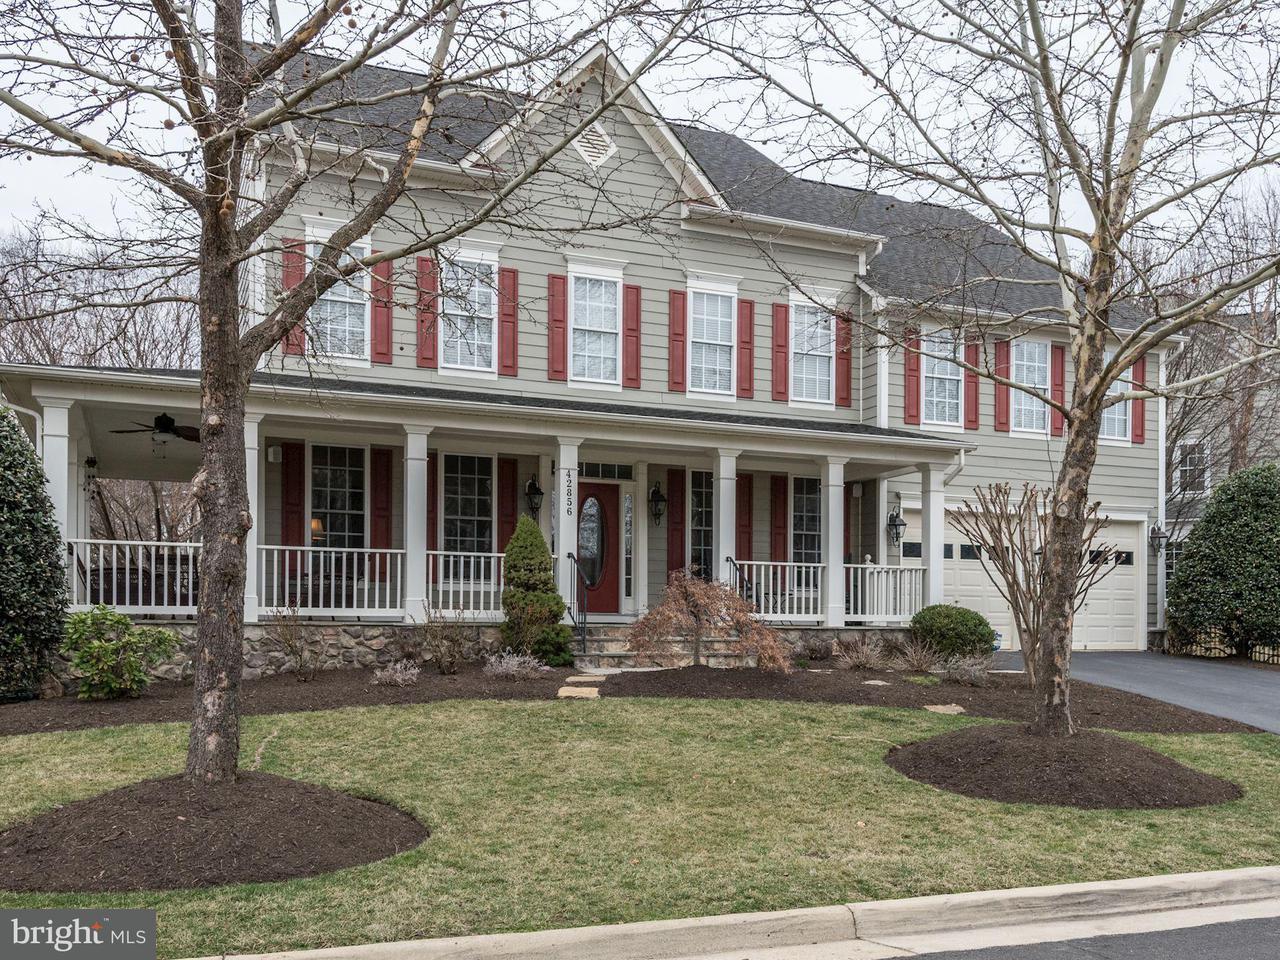 Single Family Home for Sale at 42856 Sandhurst Court 42856 Sandhurst Court Broadlands, Virginia 20148 United States